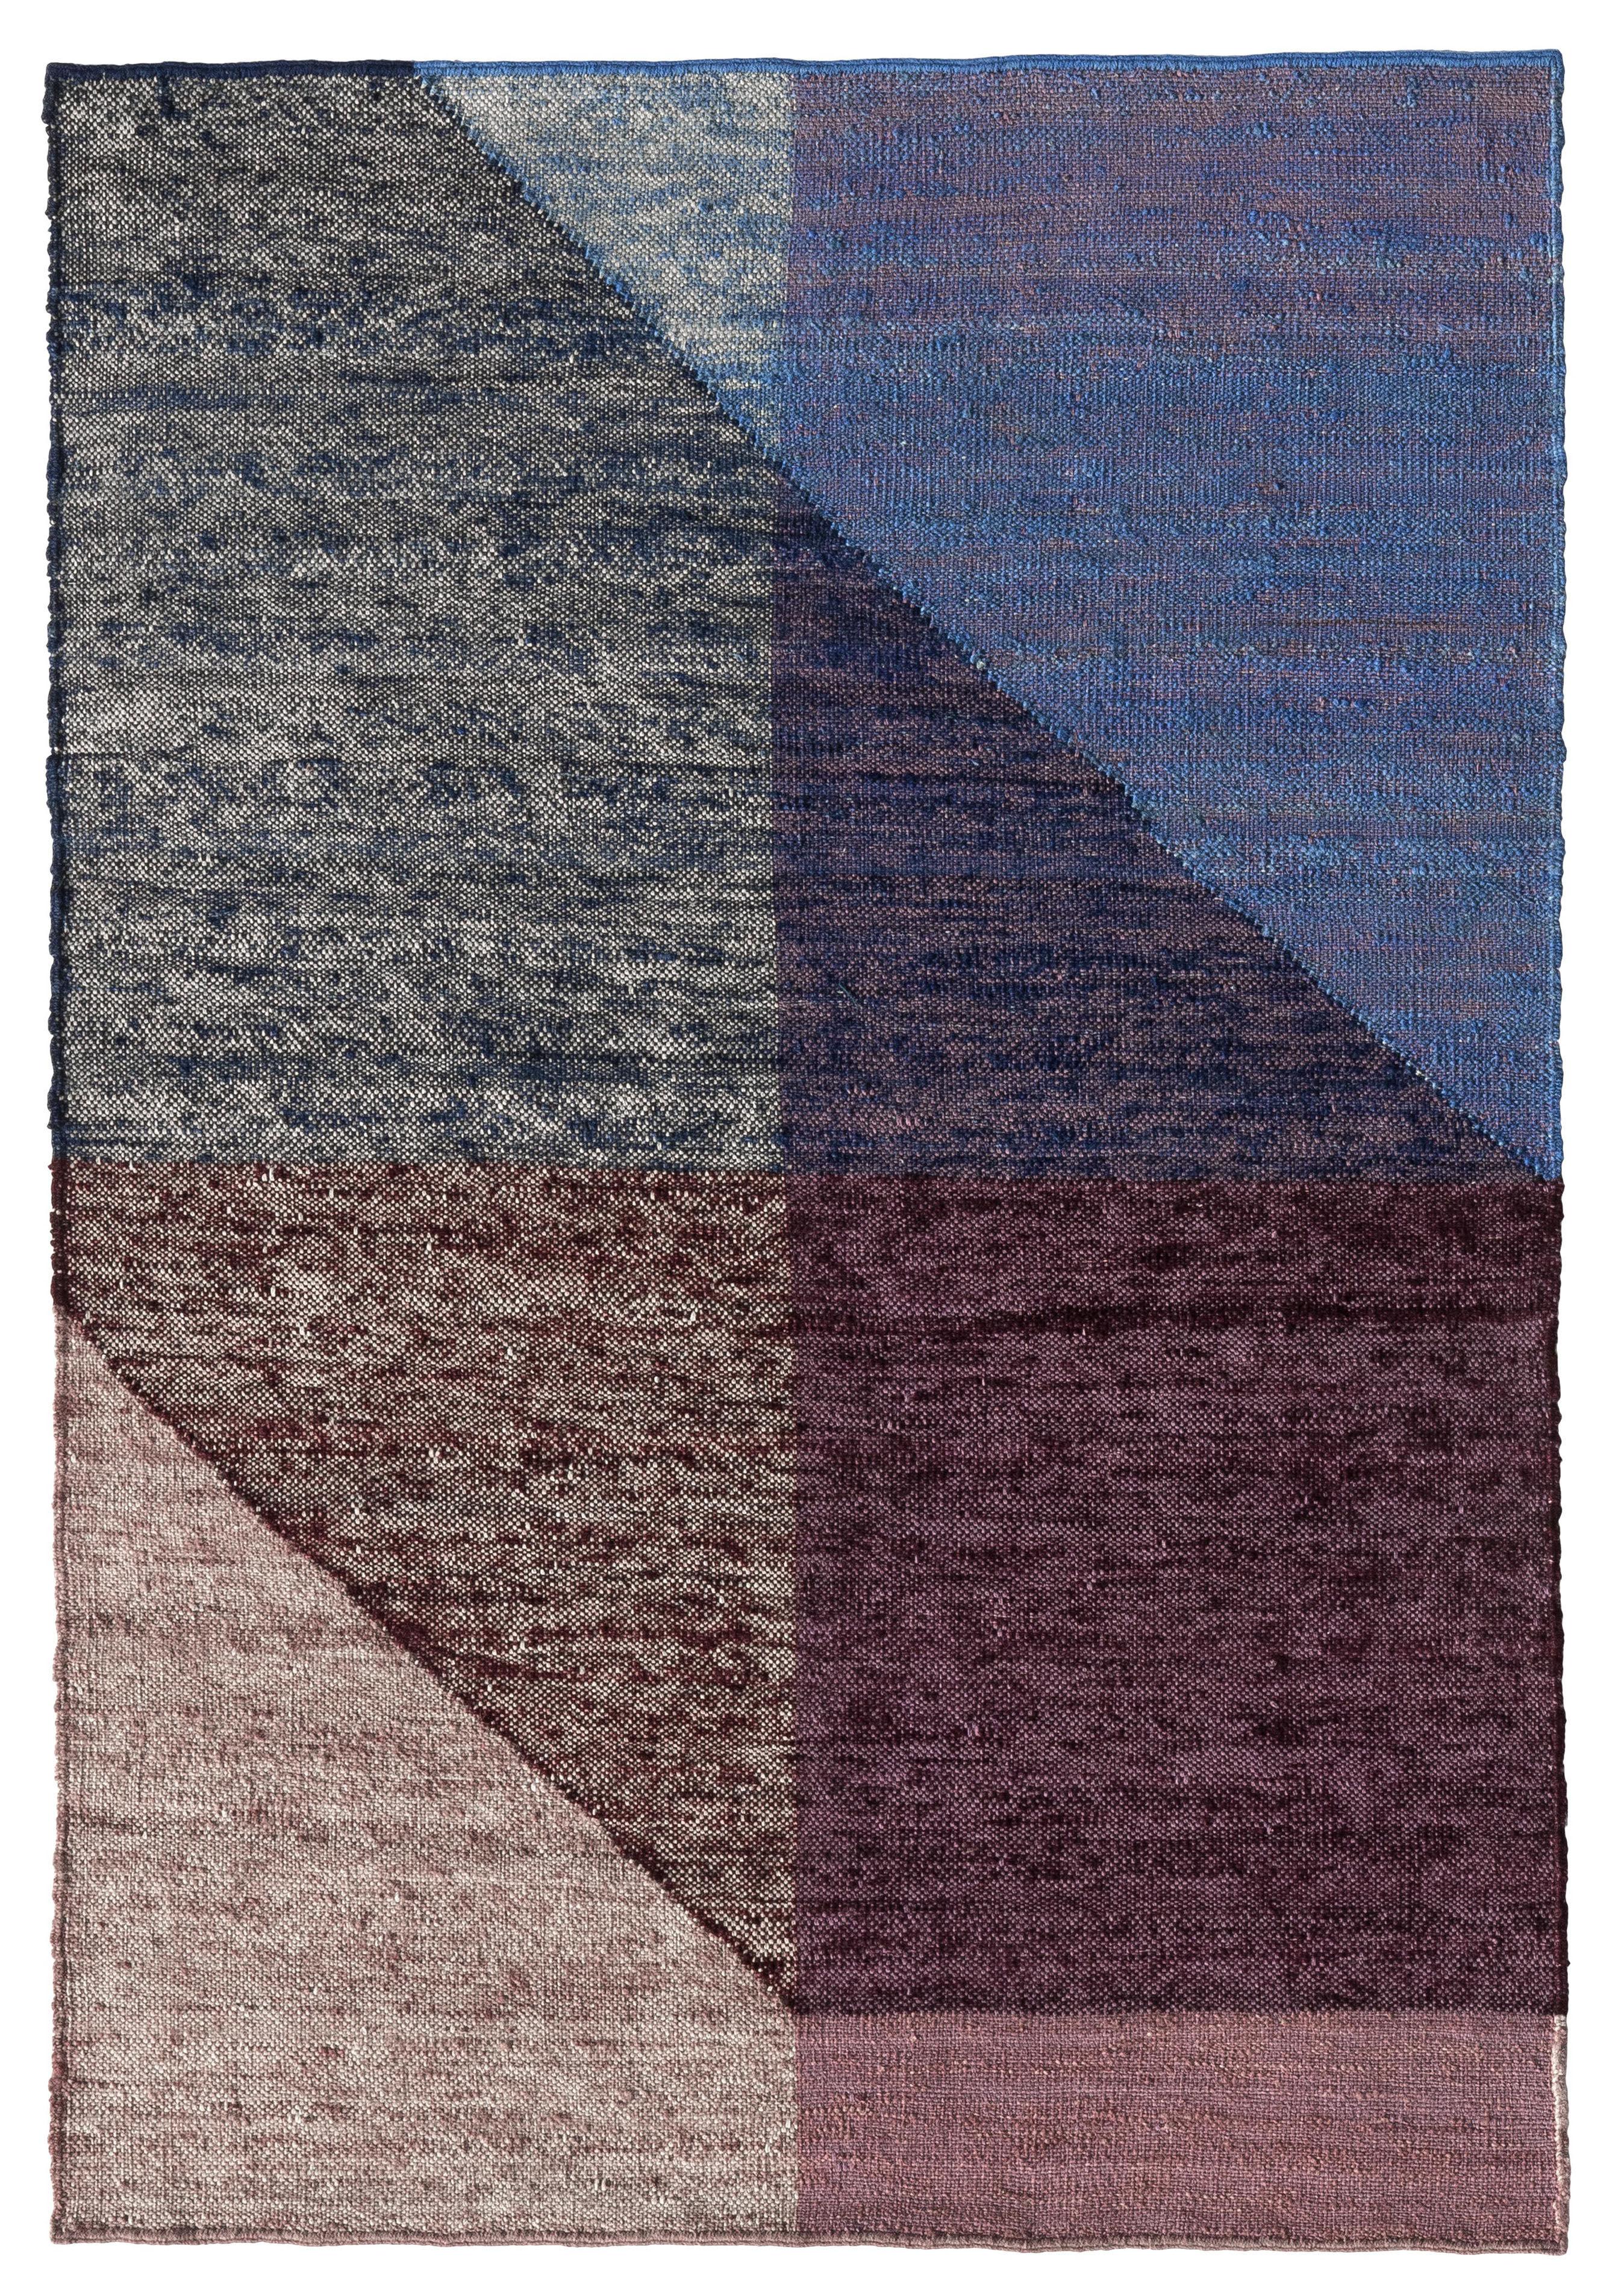 Decoration - Rugs - Capas 3 Rug - / 200 x 300 cm by Nanimarquina - Purple & blue - Wool